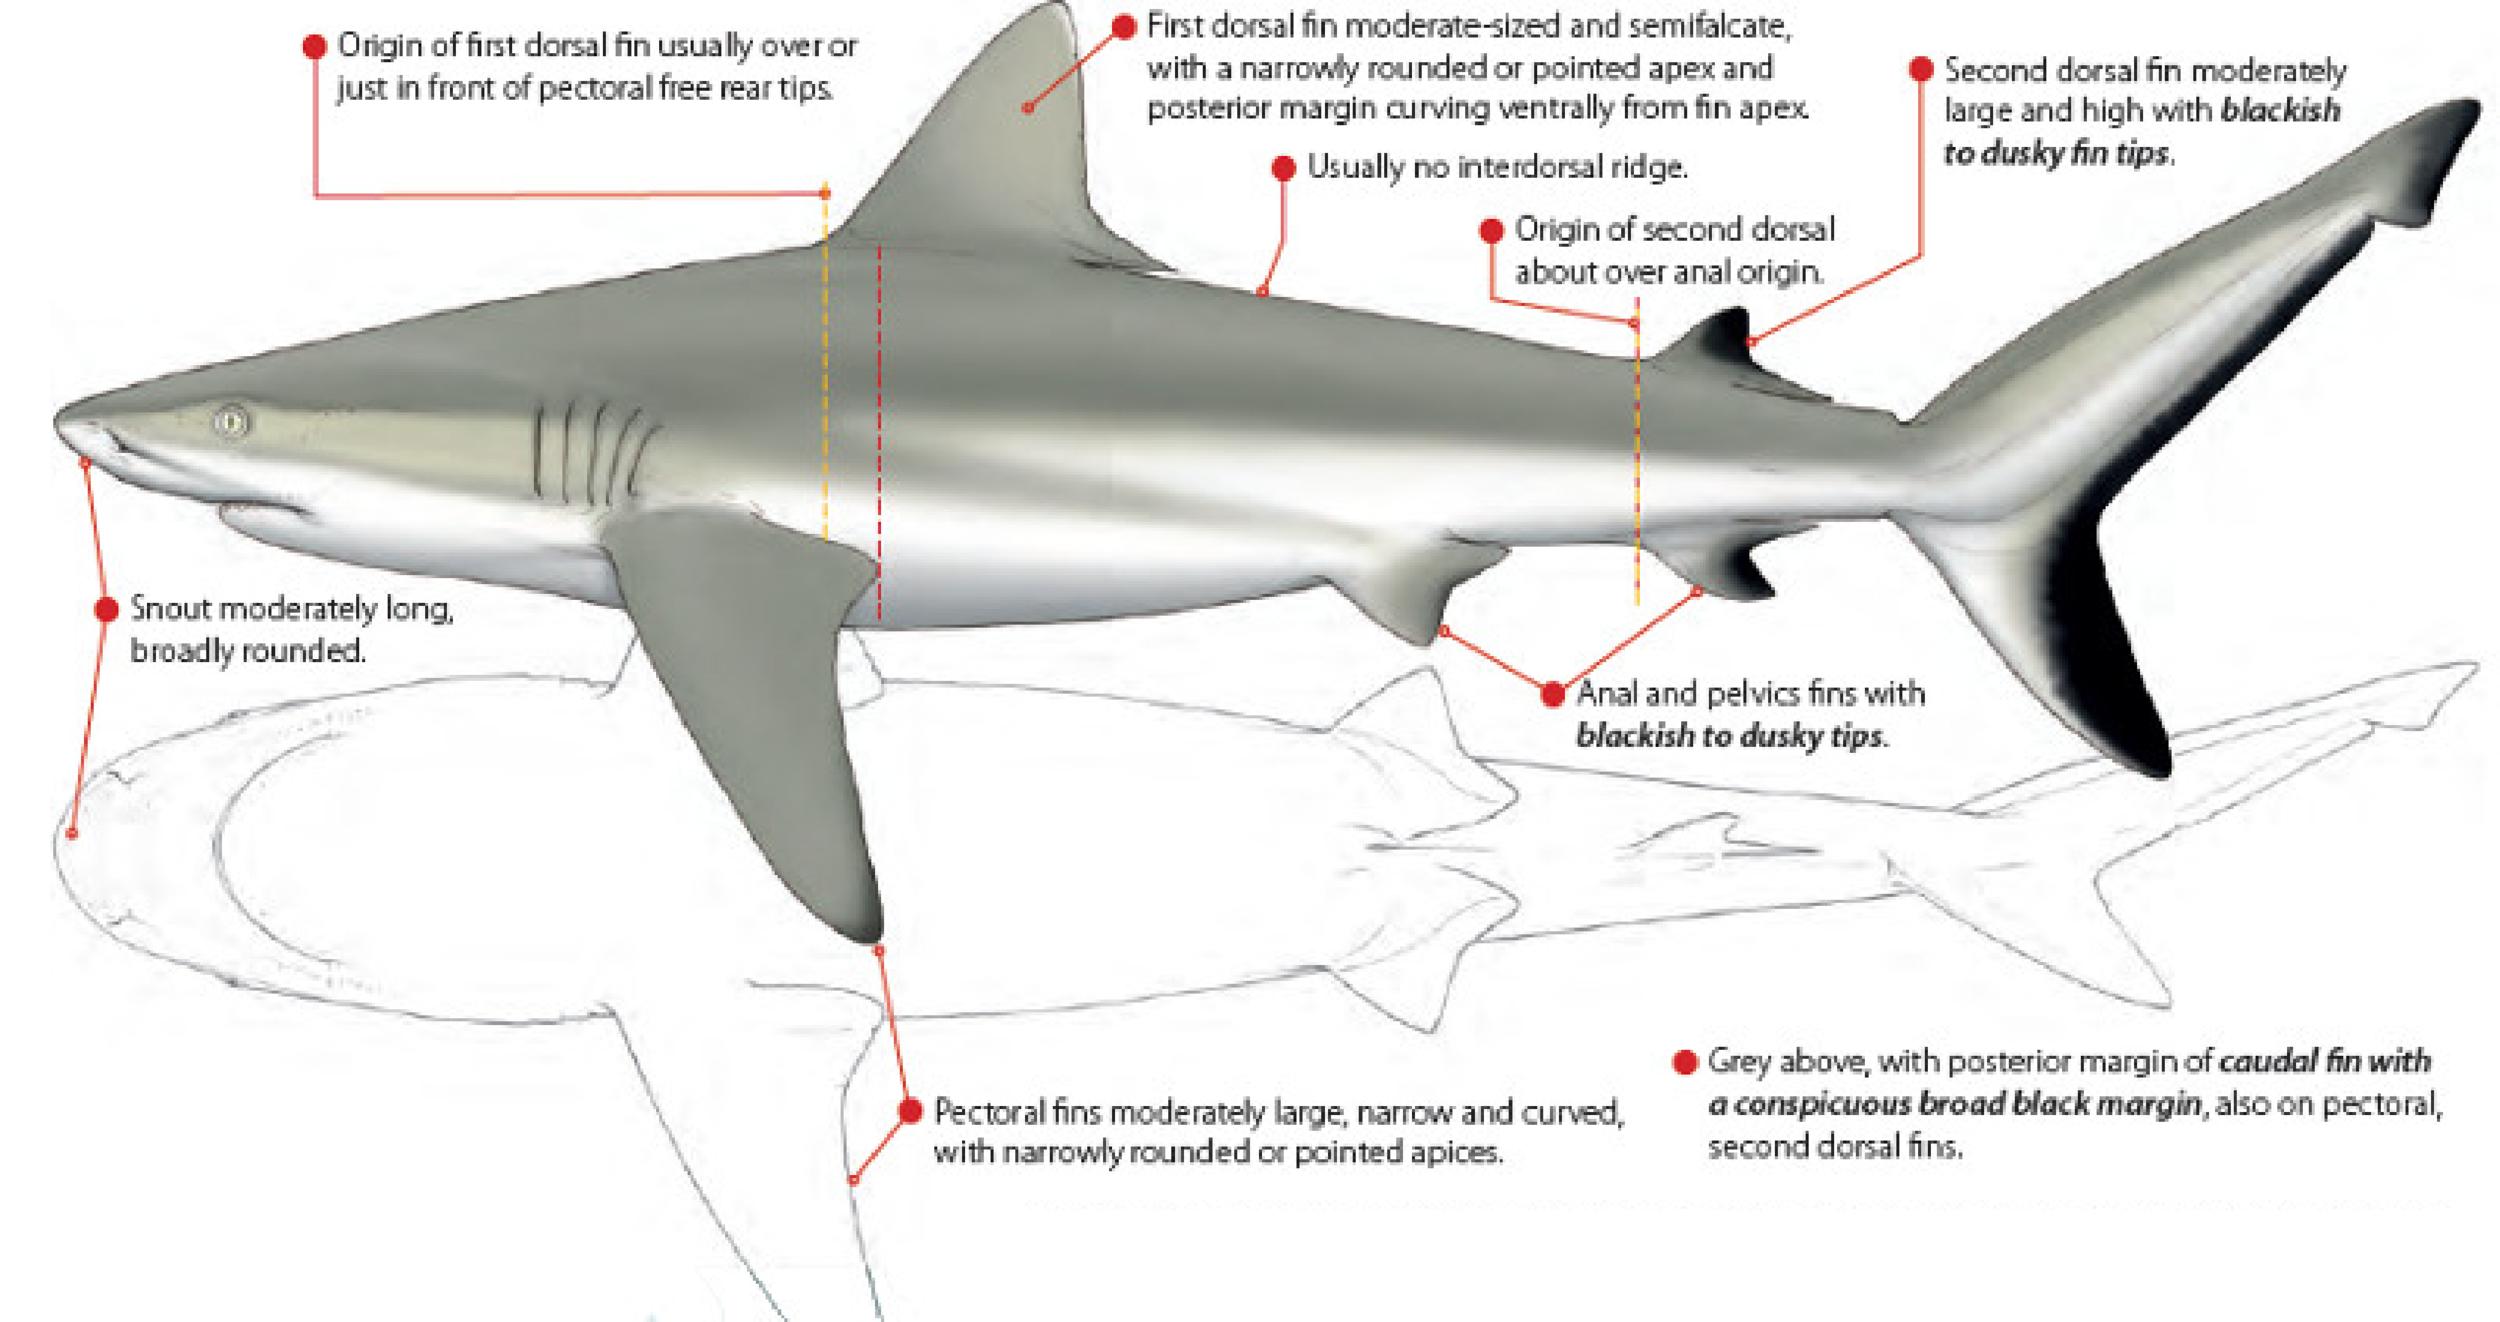 Carcharhinus amblyrhynchos.jpg.pagespeed.ic.PaJJryUKMa.png